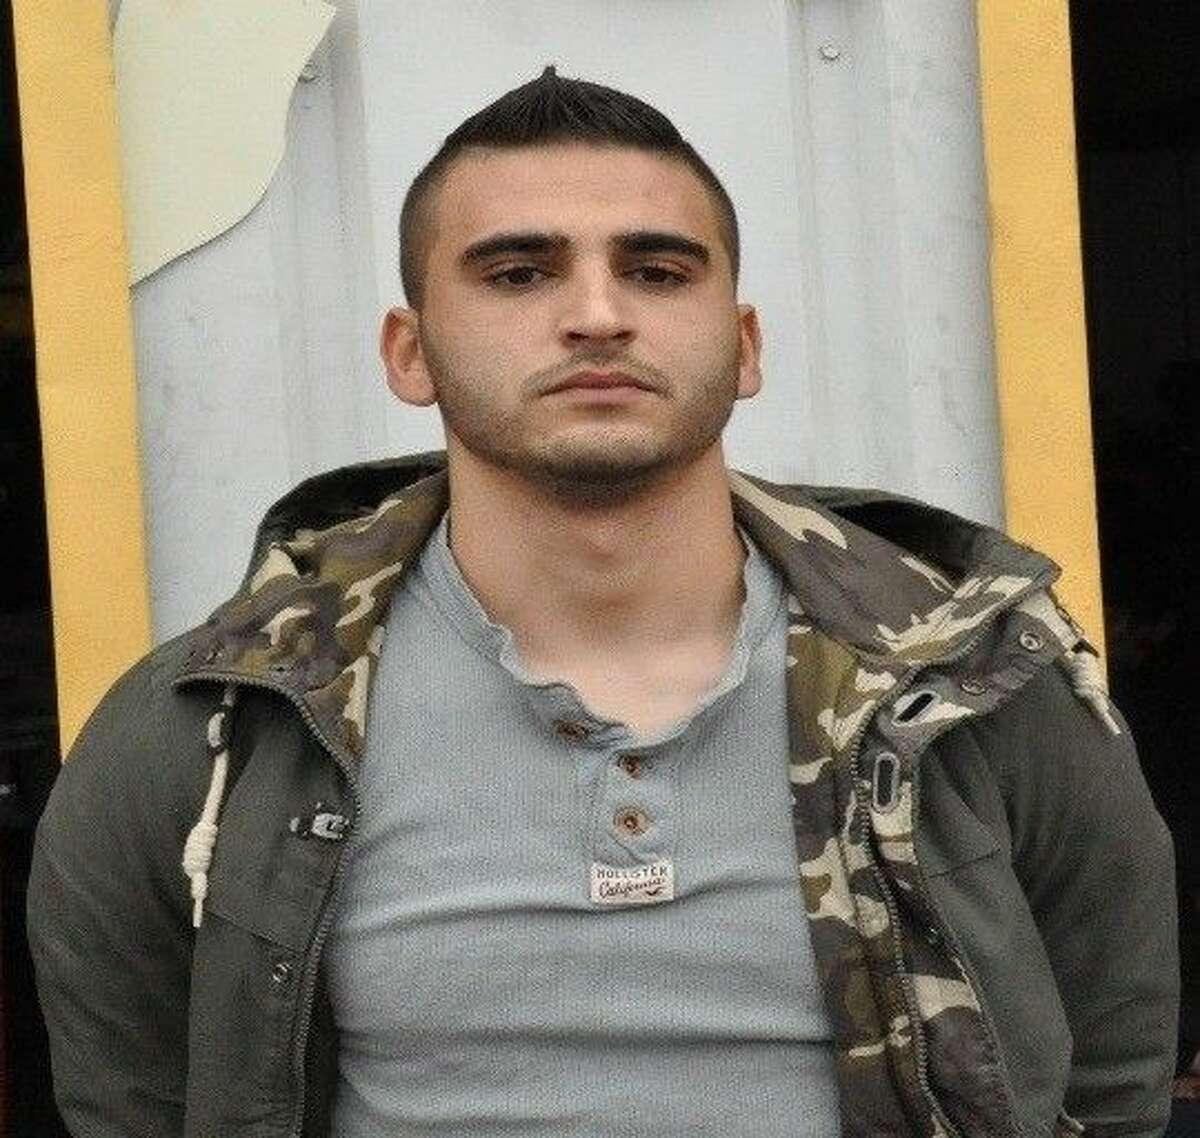 Ahmad Fouad Al-Zoubi